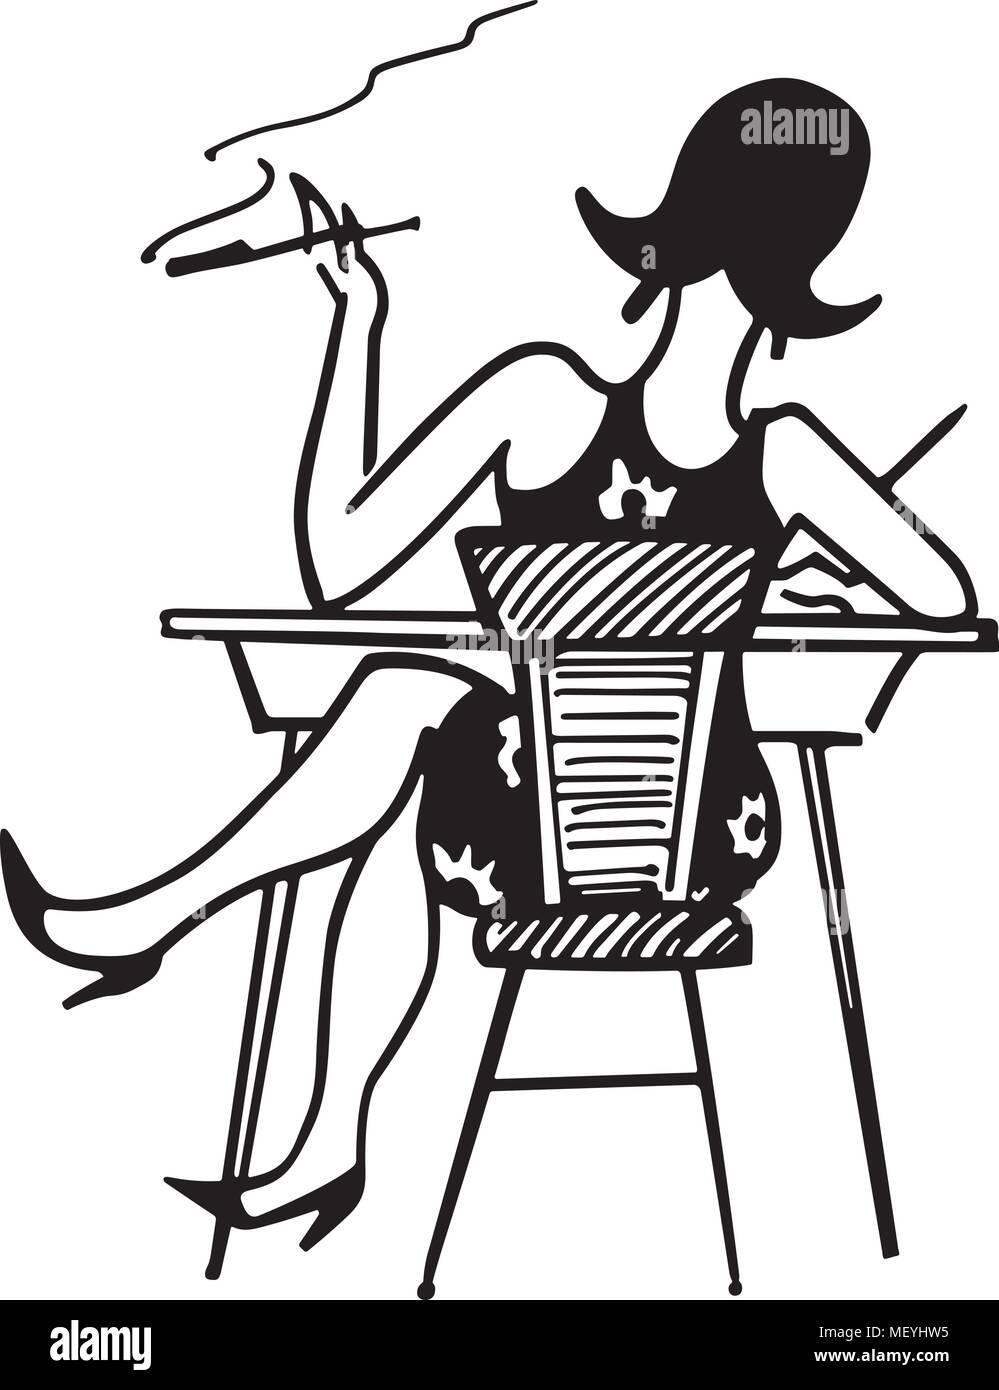 Bürotisch clipart  Gal Working At Desk - Retro Clipart Illustration Stock Vector Art ...